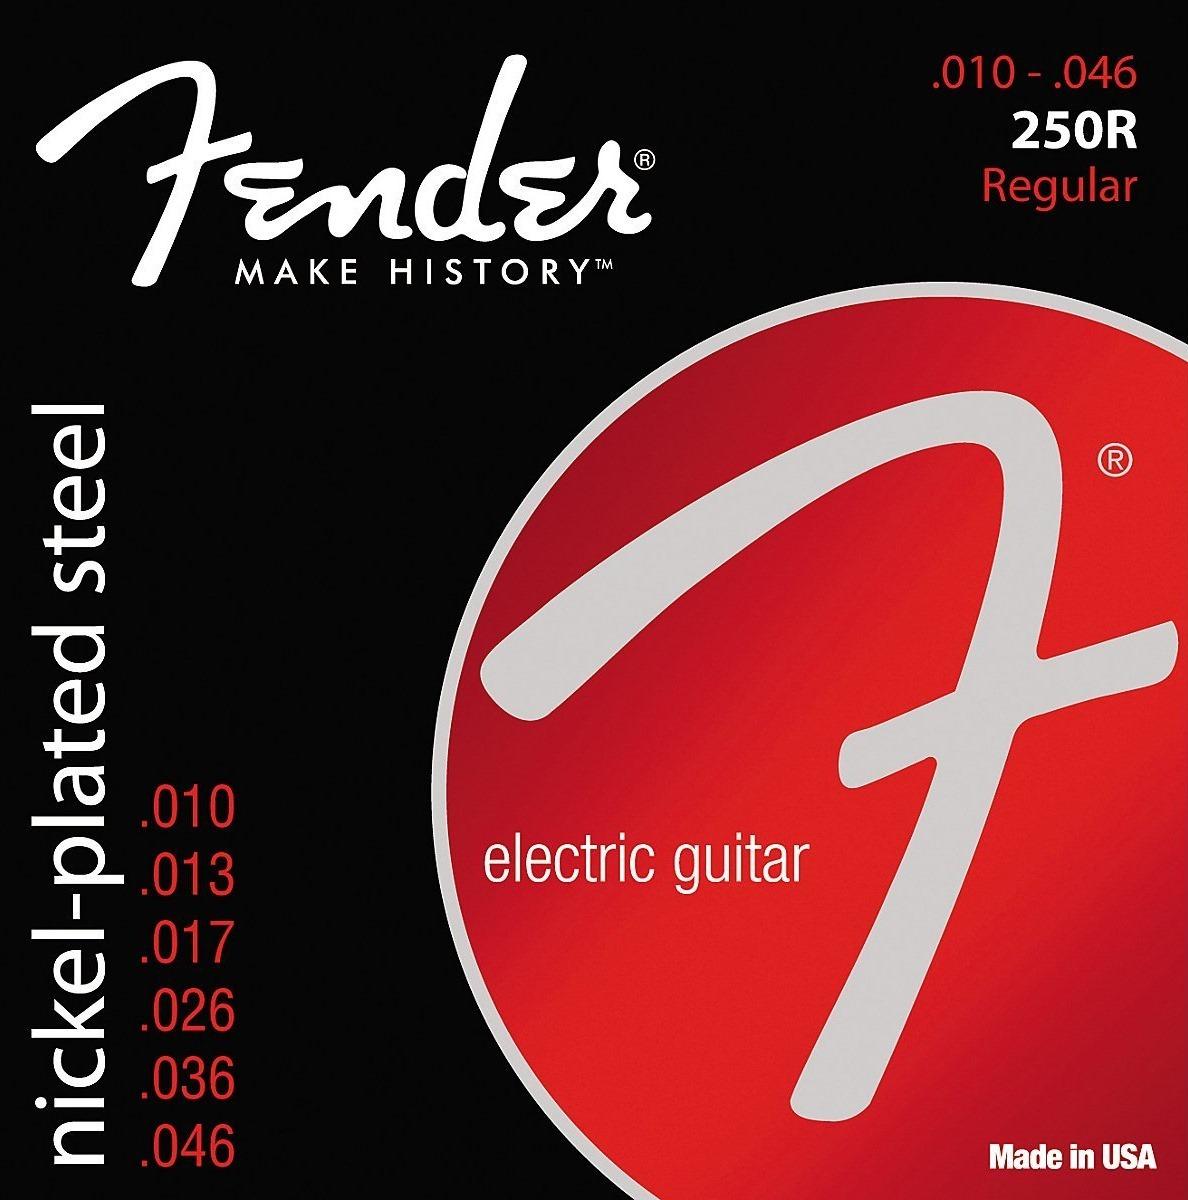 FENDER STRINGS 250R струны для электрогитары, 10-46 цены онлайн